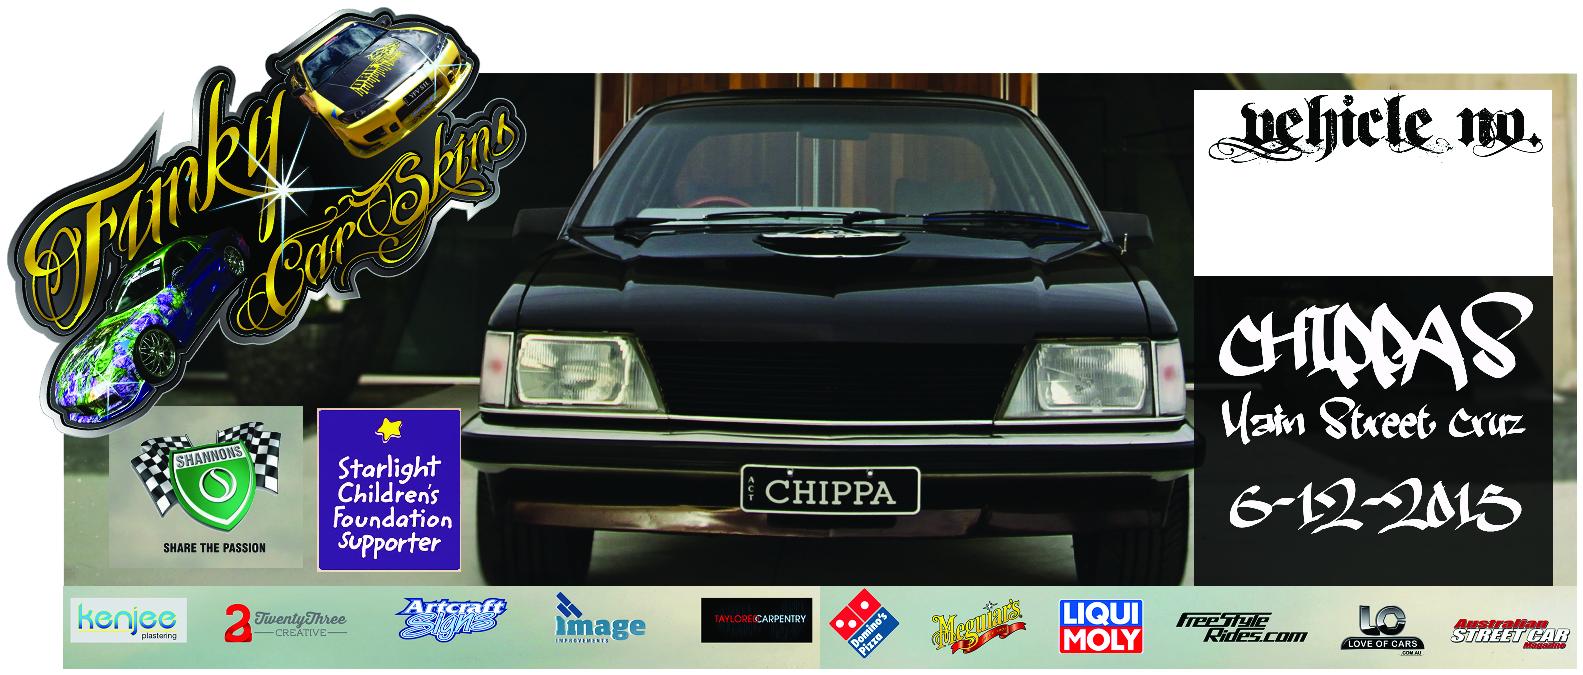 Chippas sticker-01